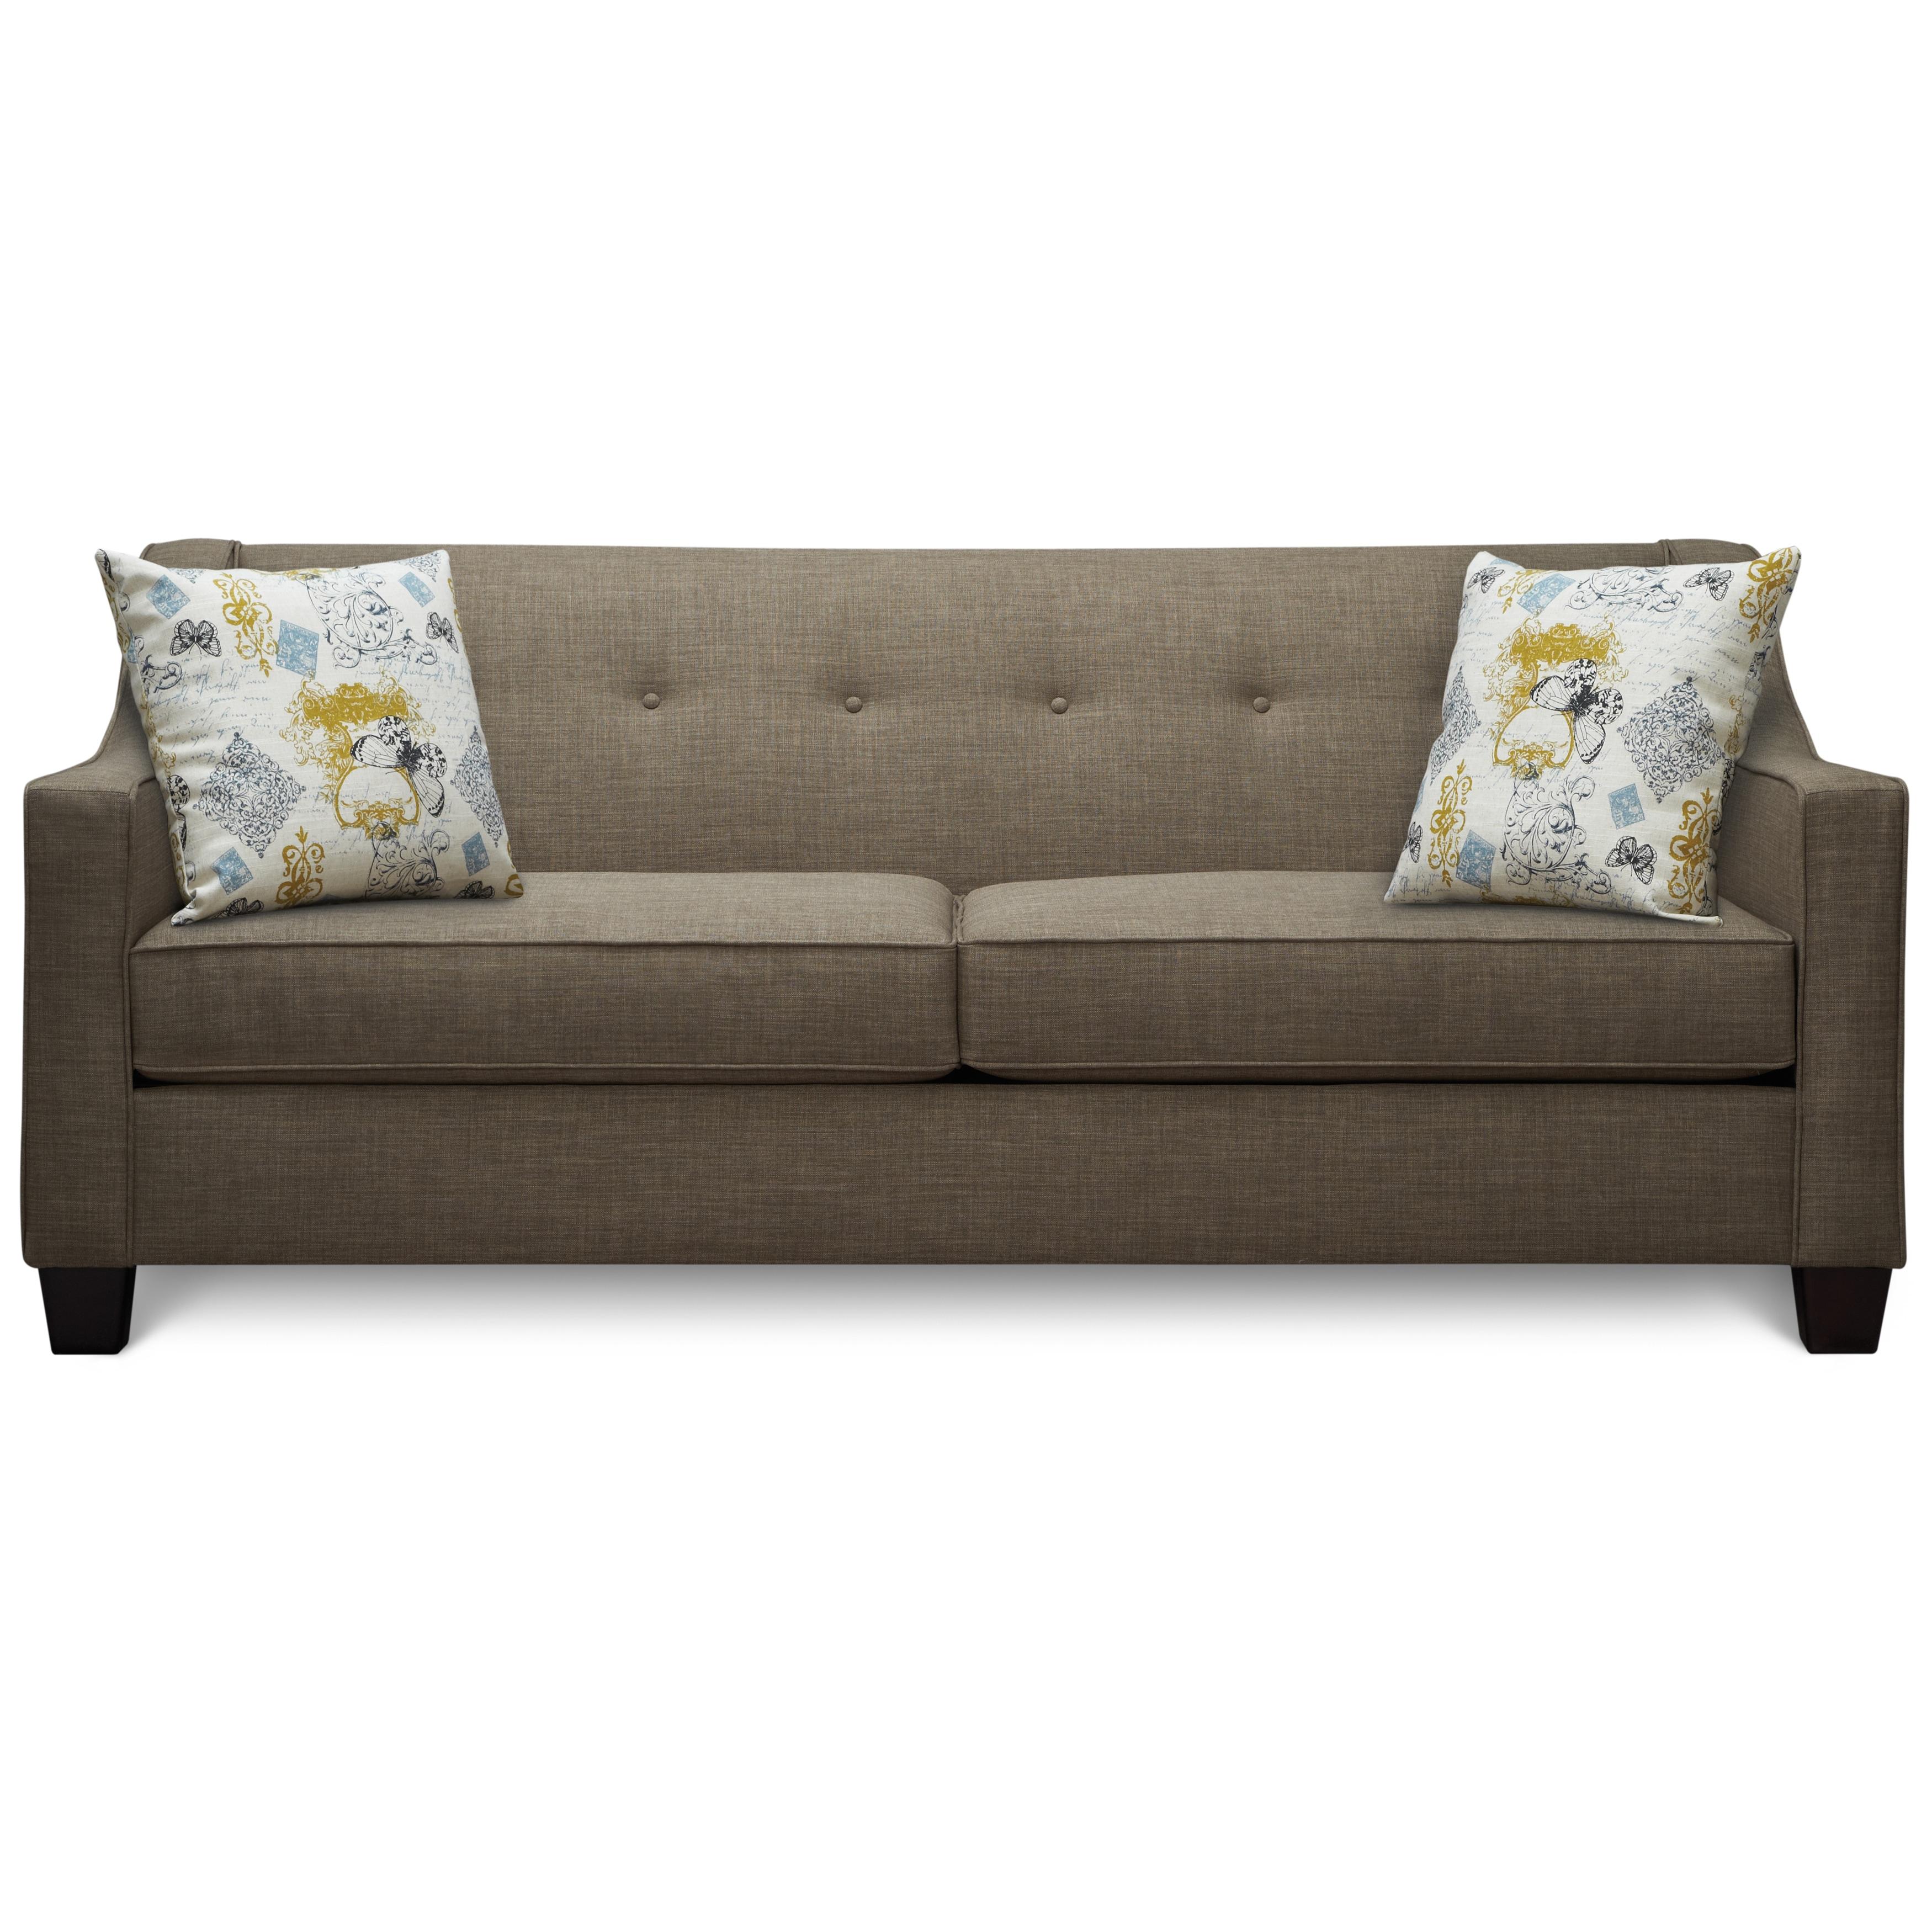 Art Van Axis Stone Sofa